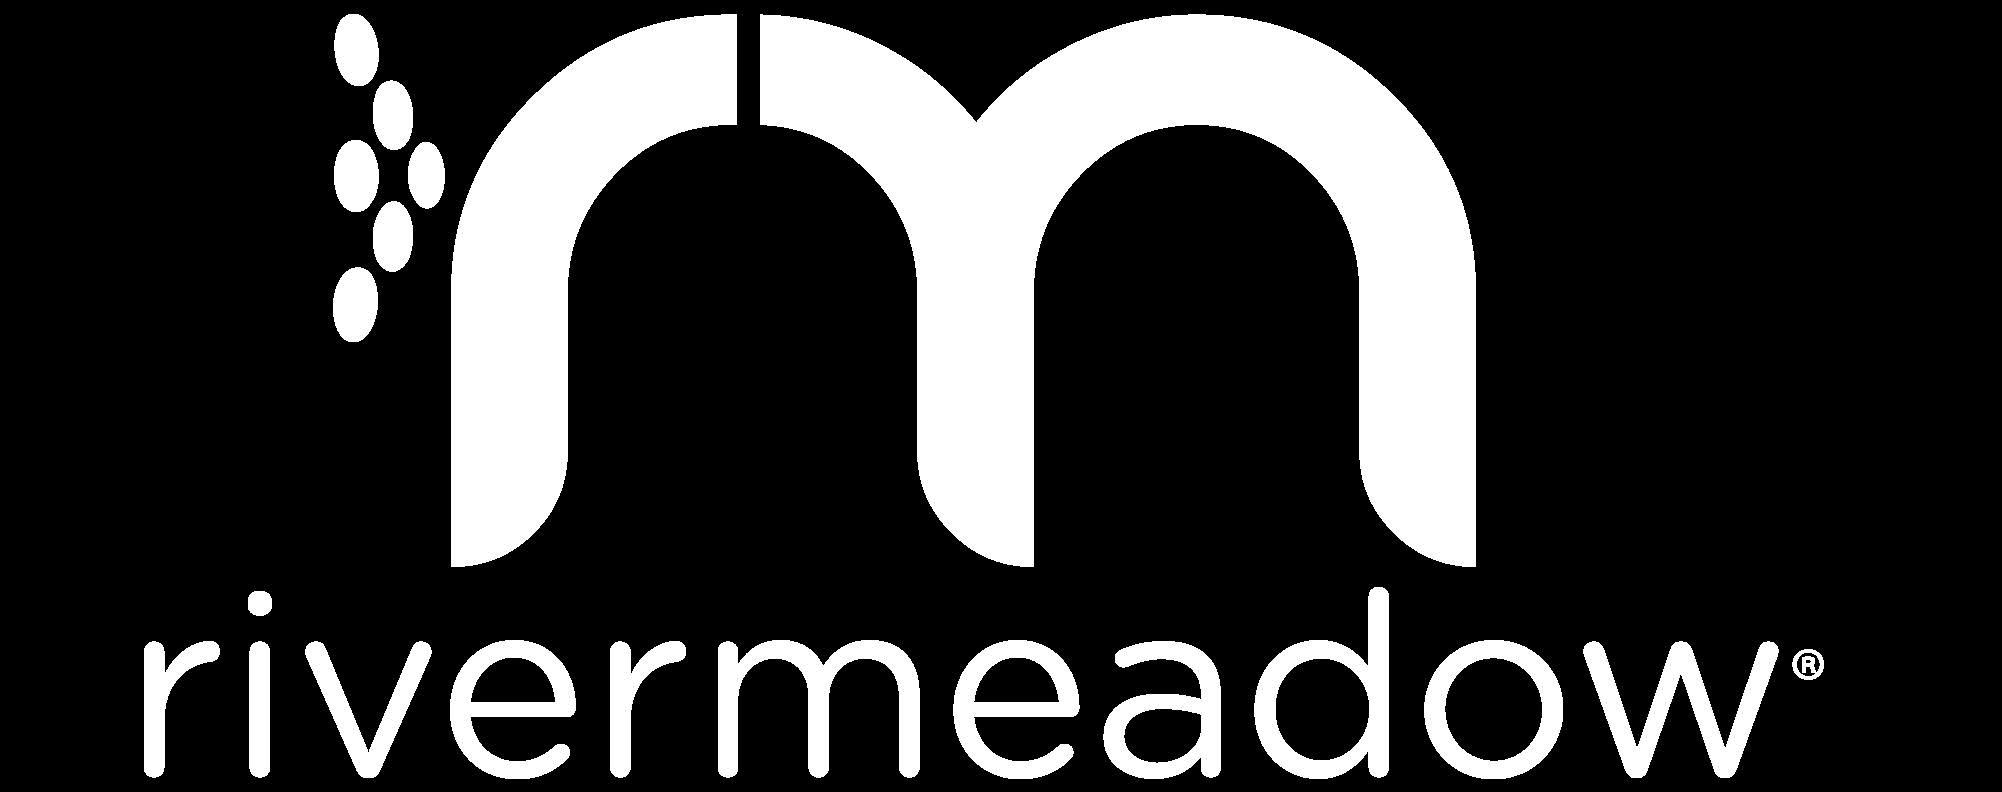 rm-logo-reg-white.png